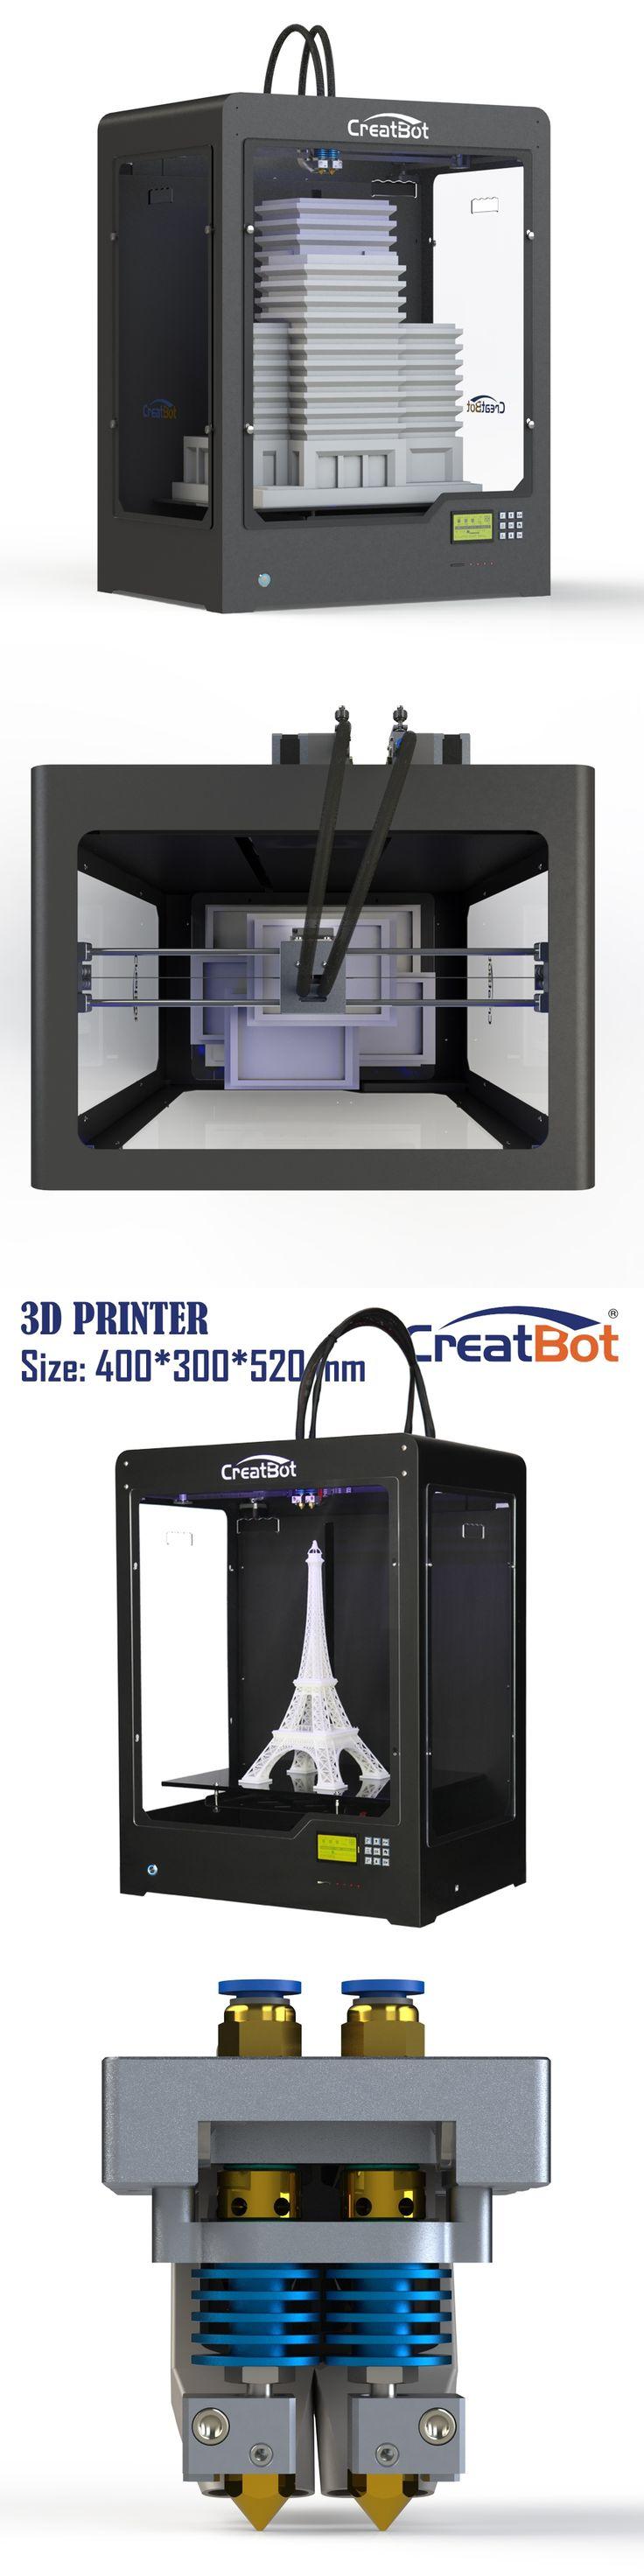 best selling DE plus 02 3d printer machine dropship dual extruders DIY modeling super big size free 2 spools ABS/PLA filament